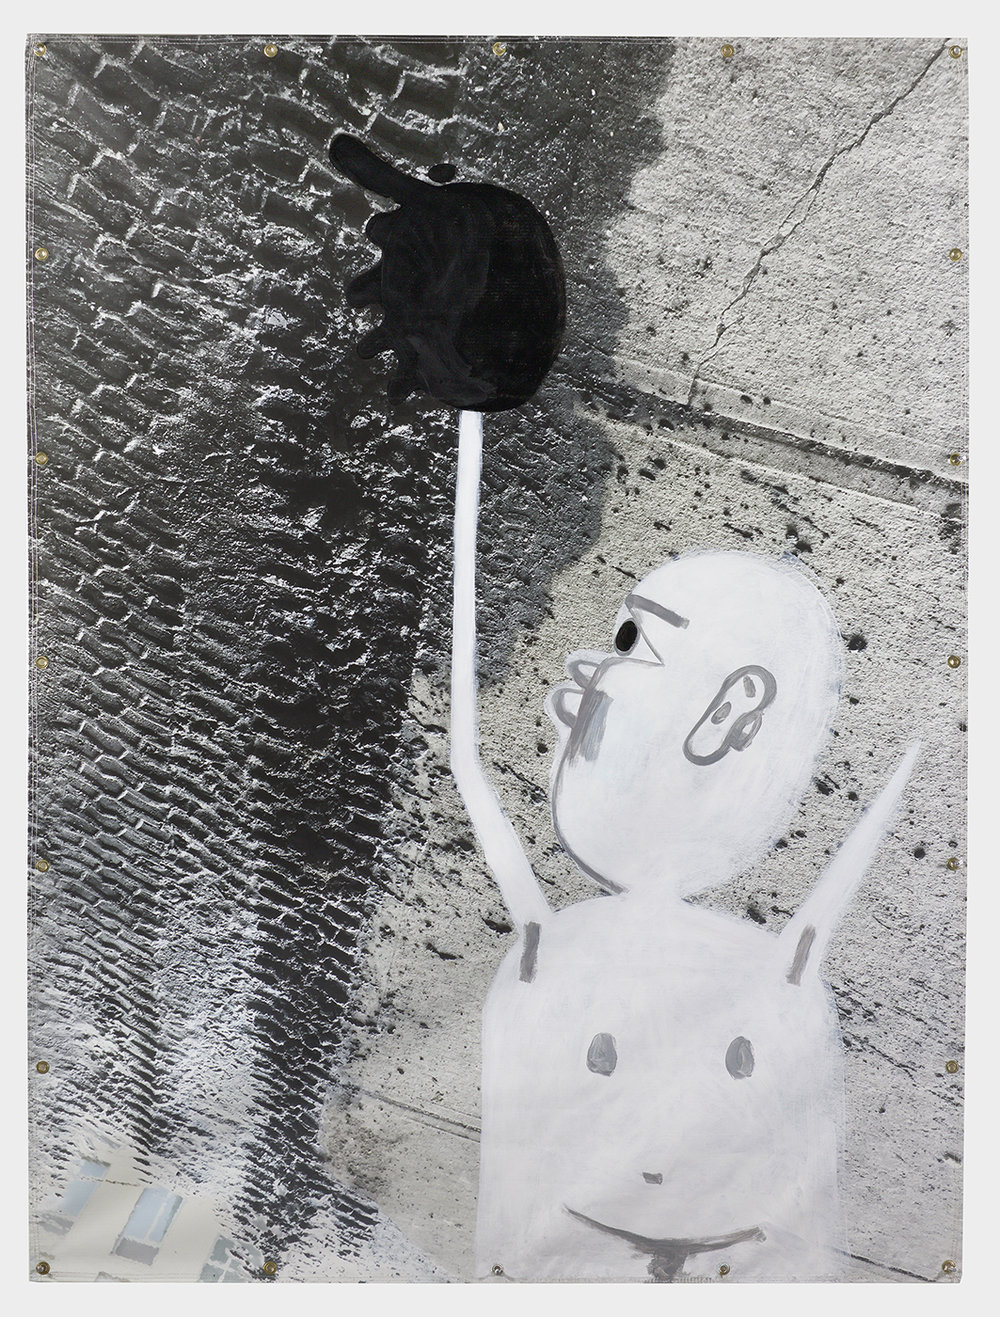 David Humphrey,  Tread,  2018, acrylic on printed vinyl, 79.5h x 60w in.